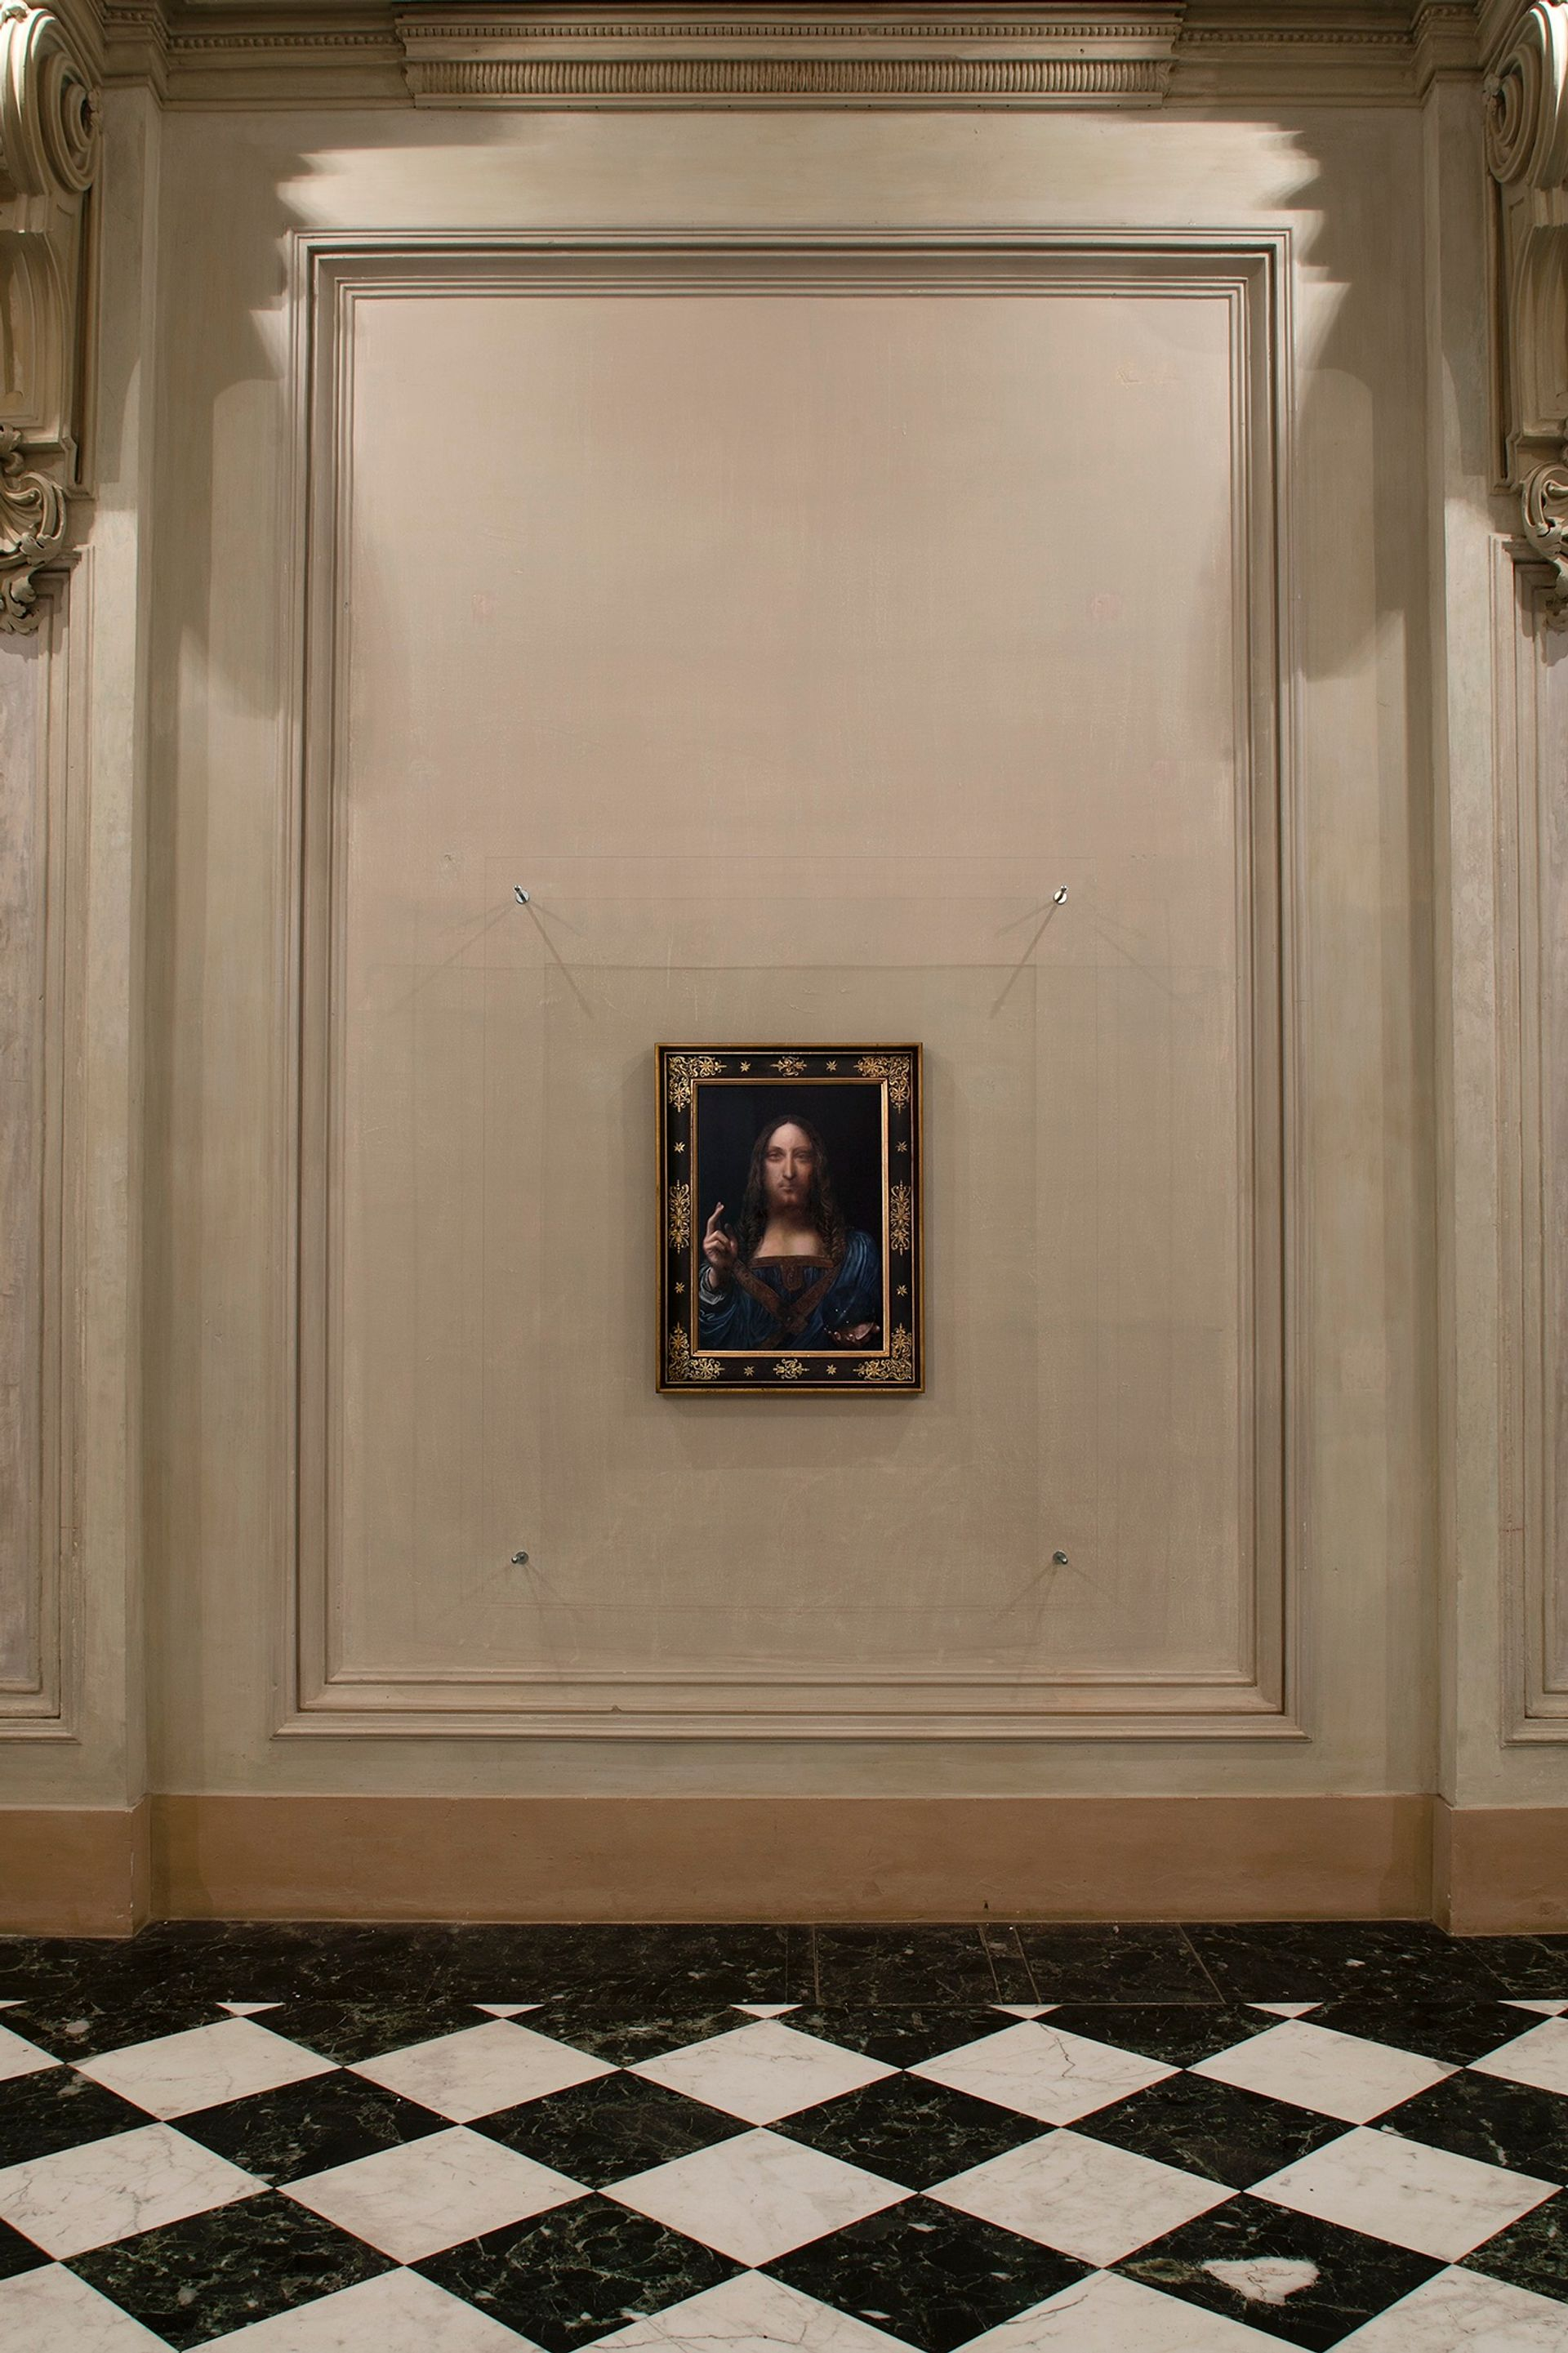 Taner Ceylan's Salvator Mundi at the Castello di Rivoli courtesy Antonio Maniscalco